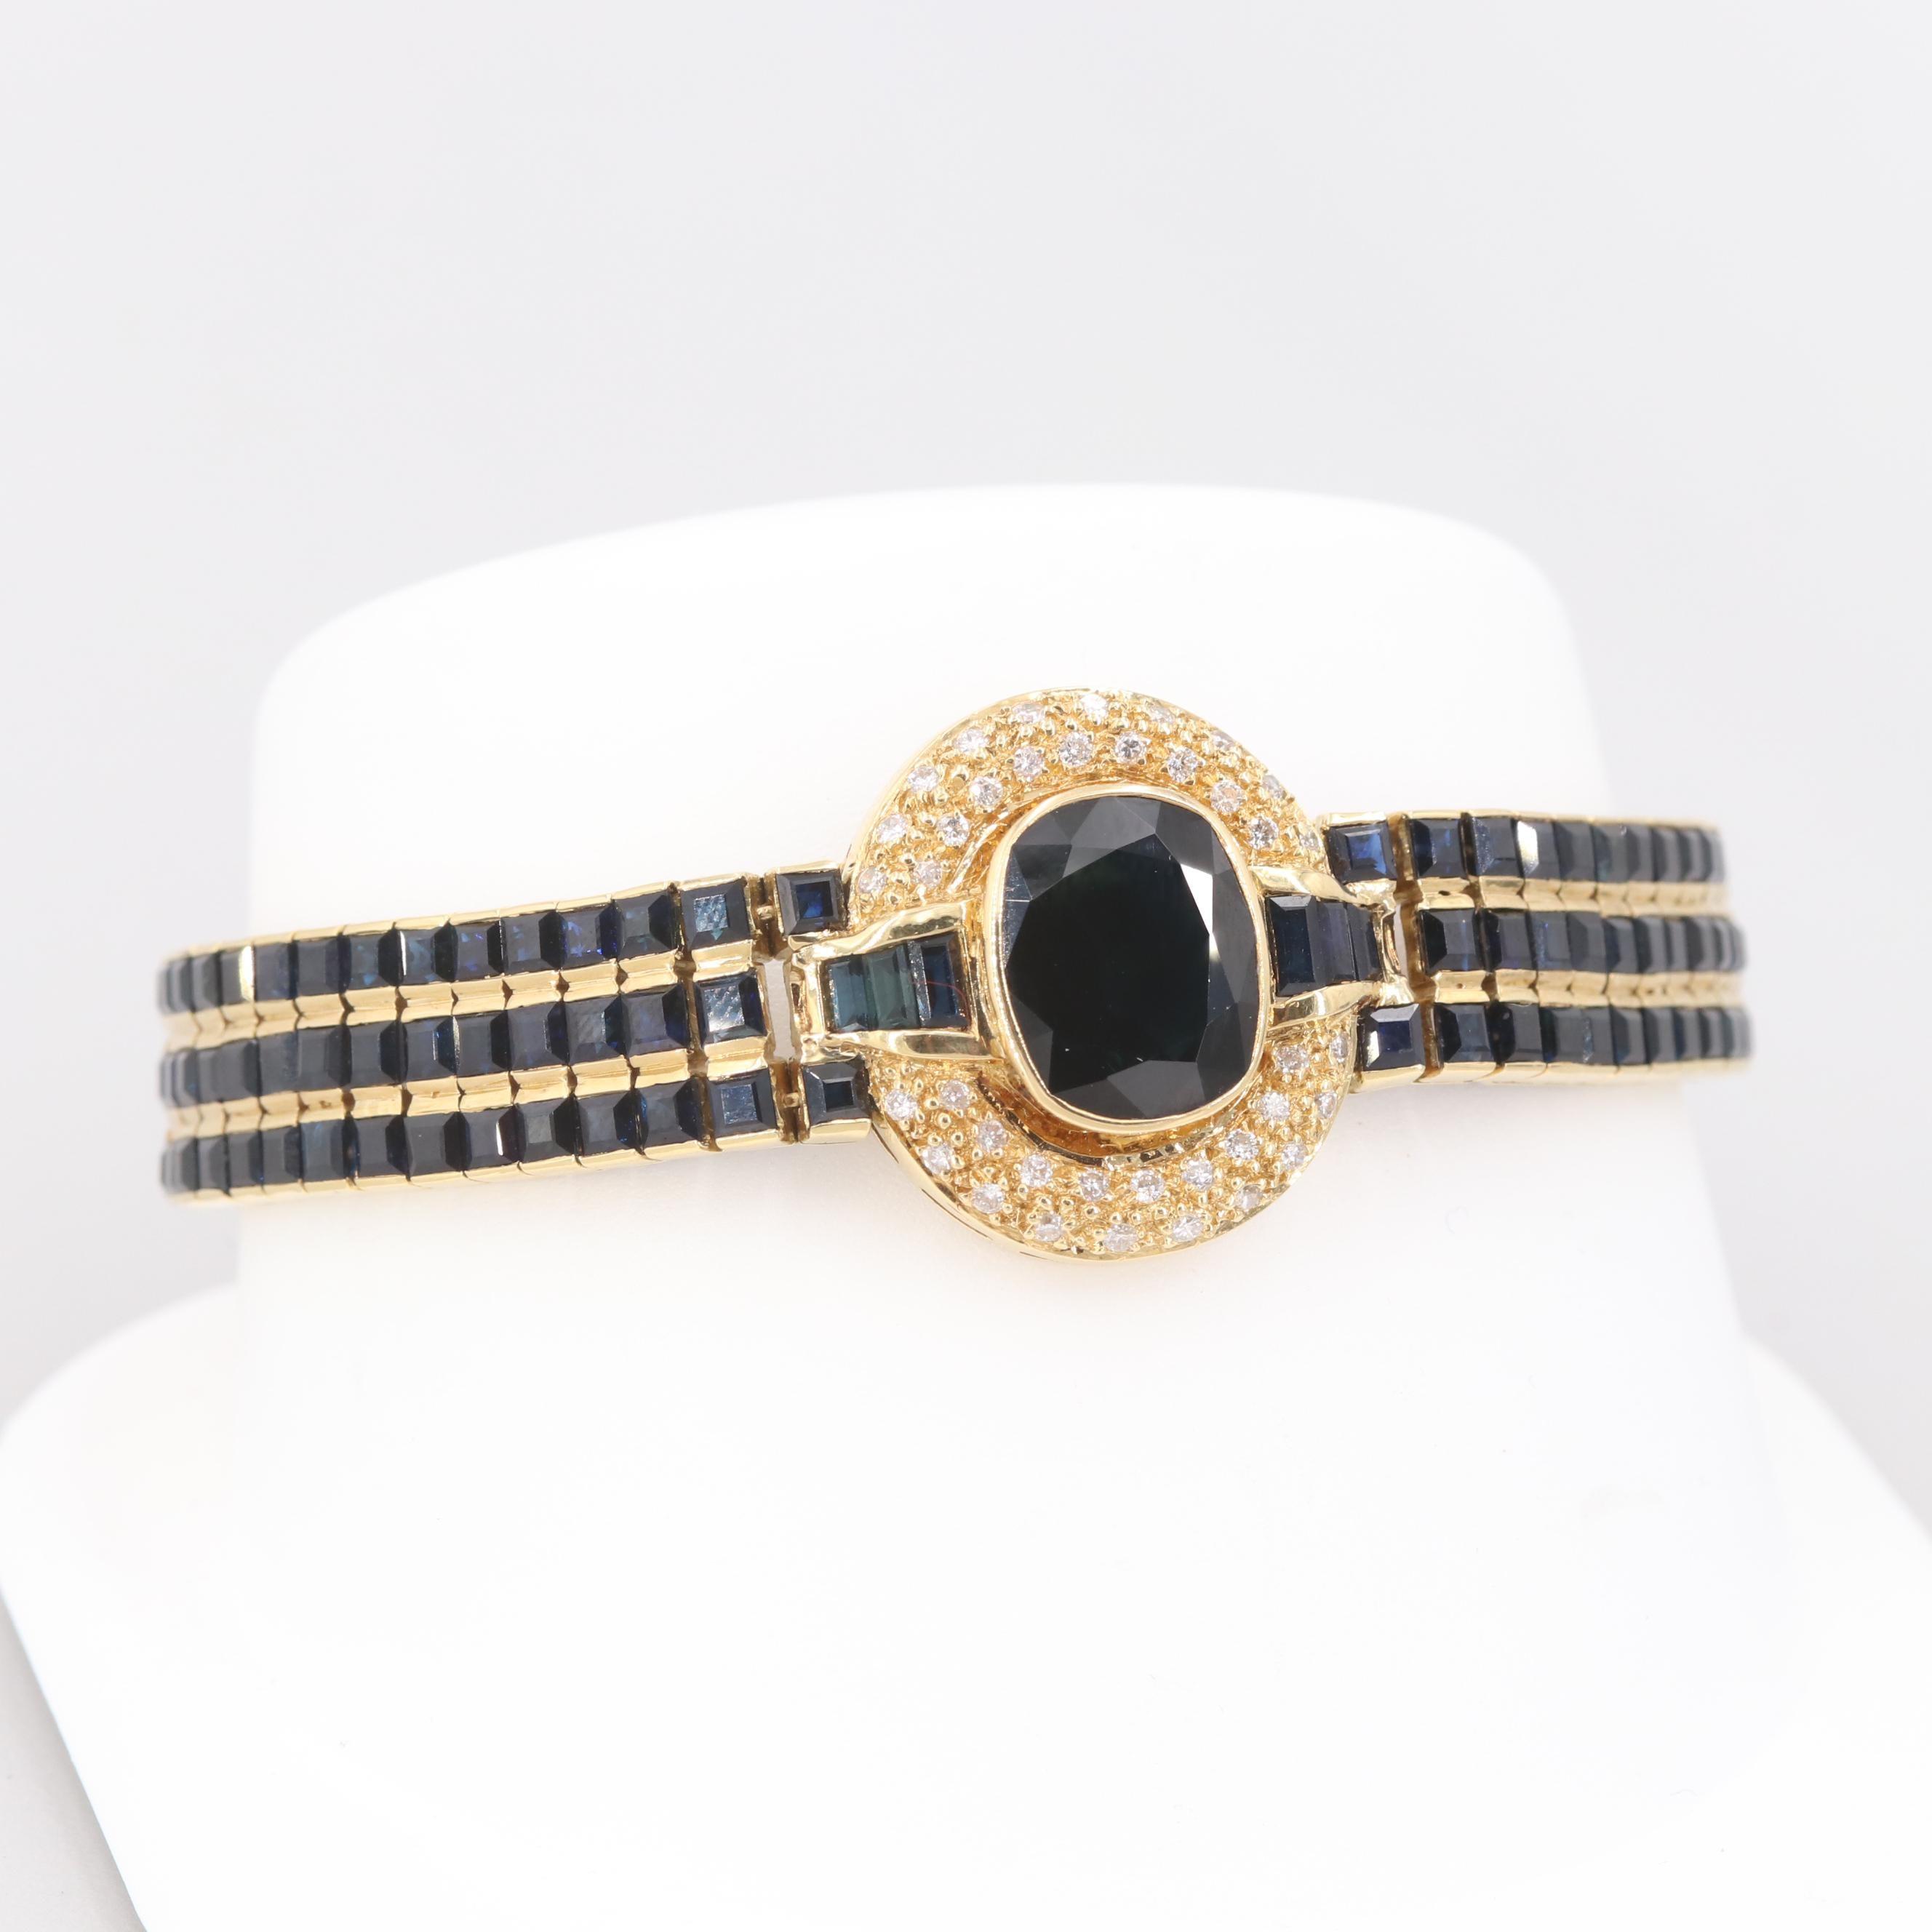 Le Vian 18K Yellow Gold Sapphire and Diamond Bracelet